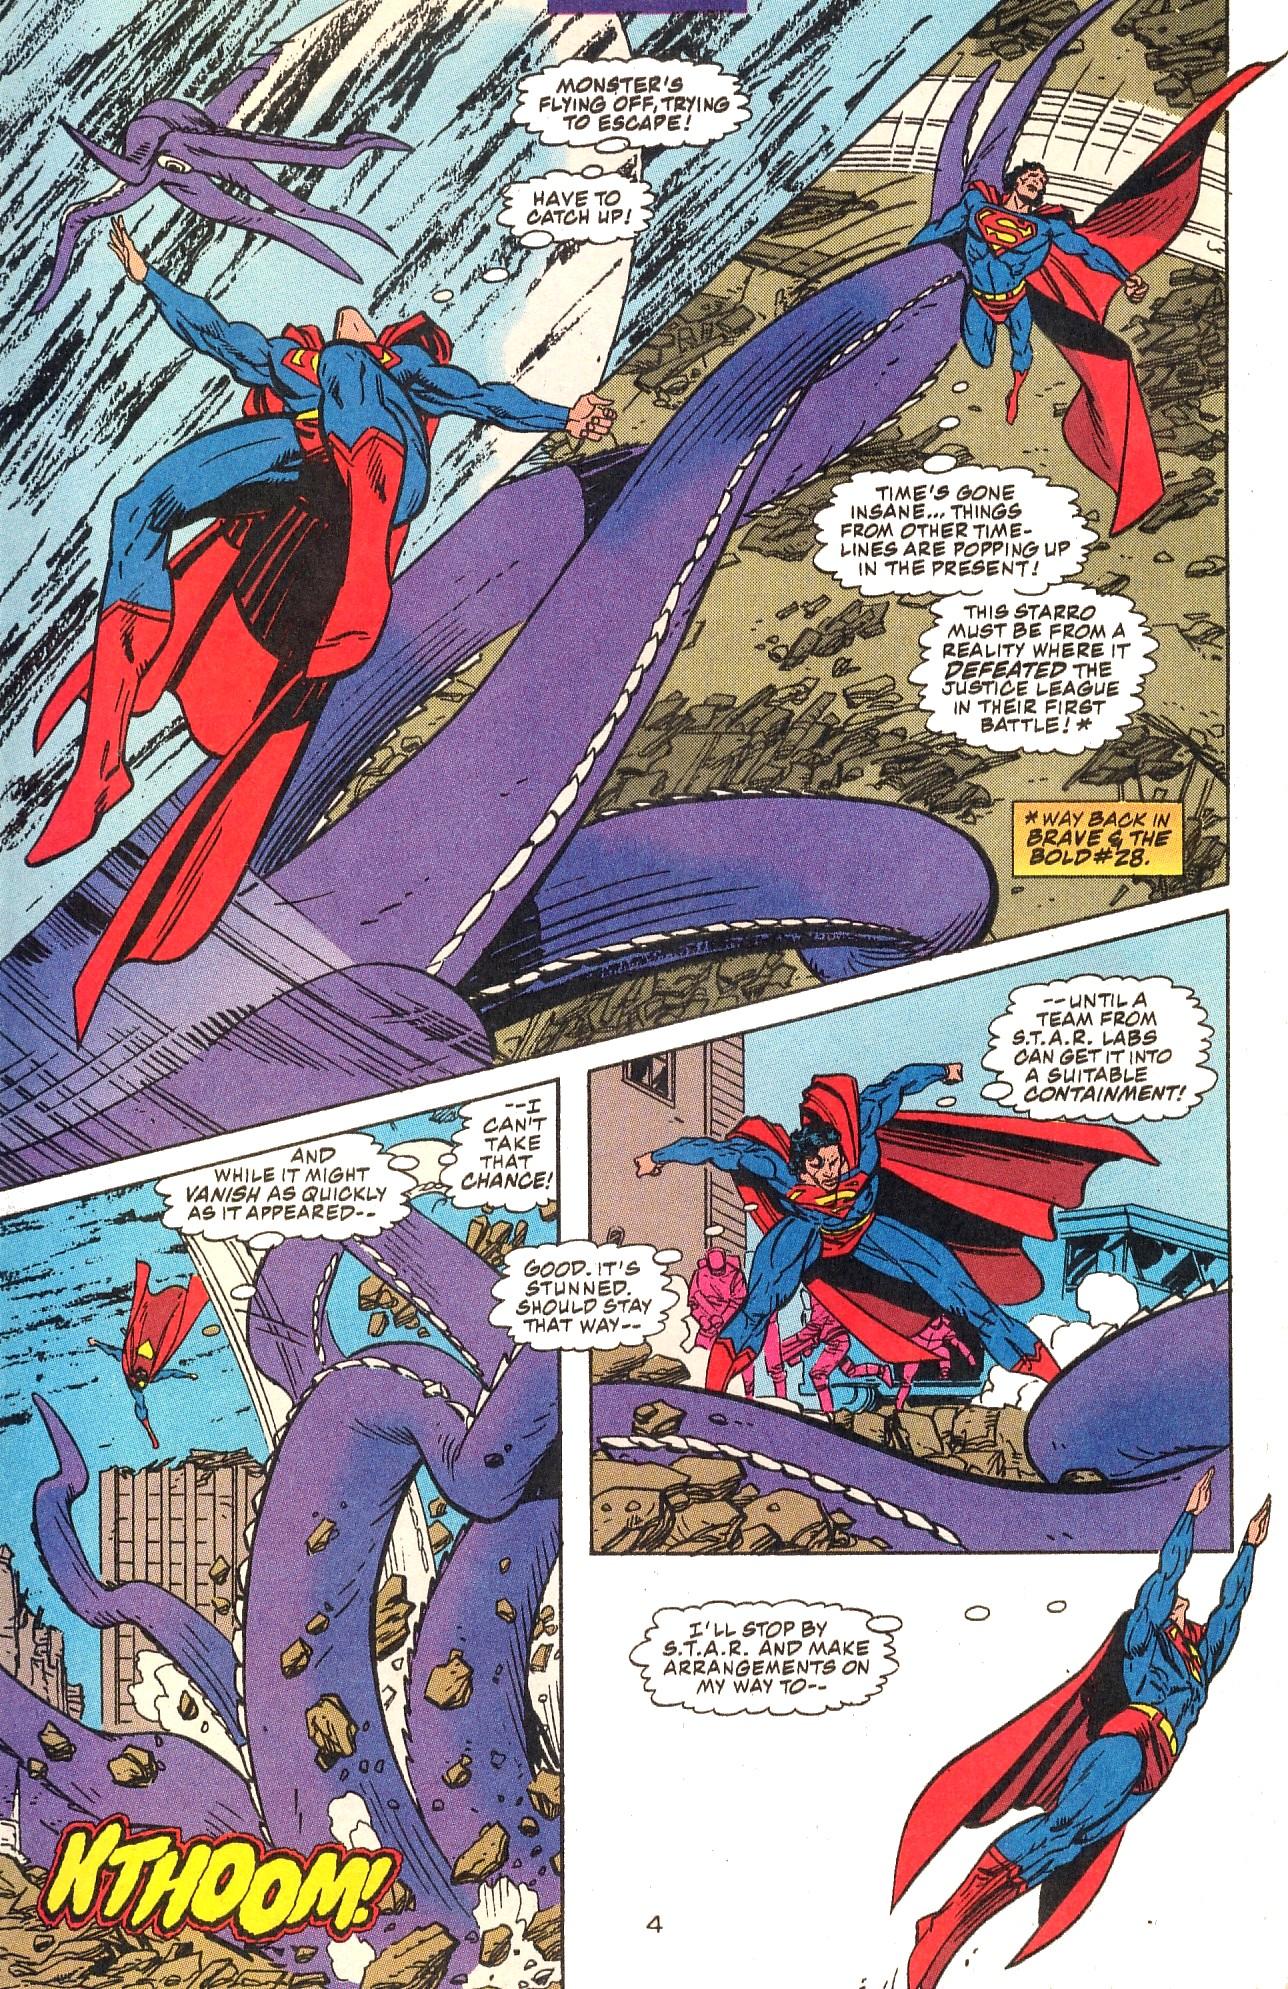 Action Comics (1938) 703 Page 4